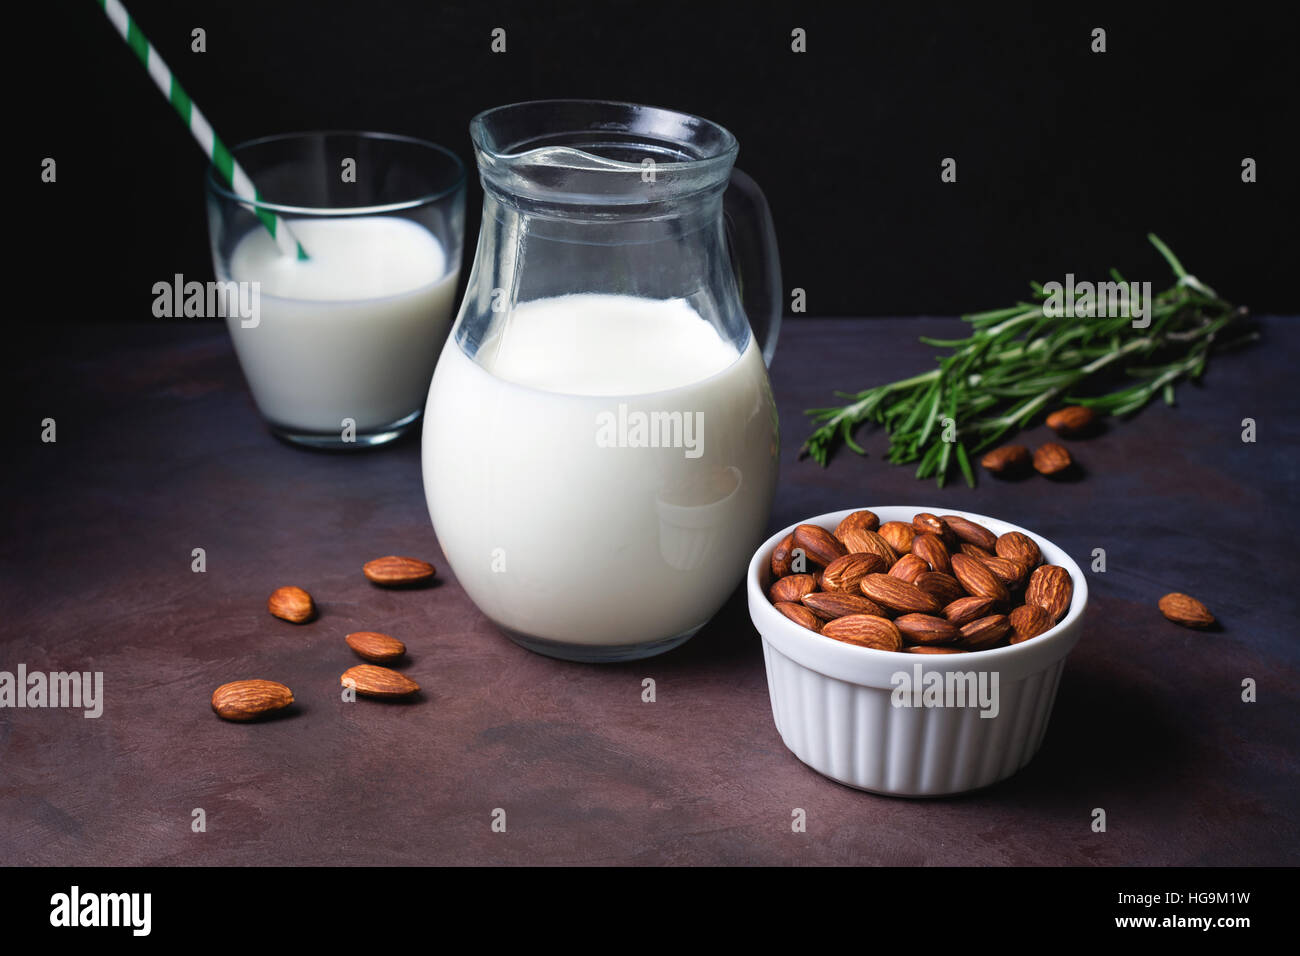 Homemade almond milk on dark rusty background over black background. Dairy free vegan milk. Toned image - Stock Image